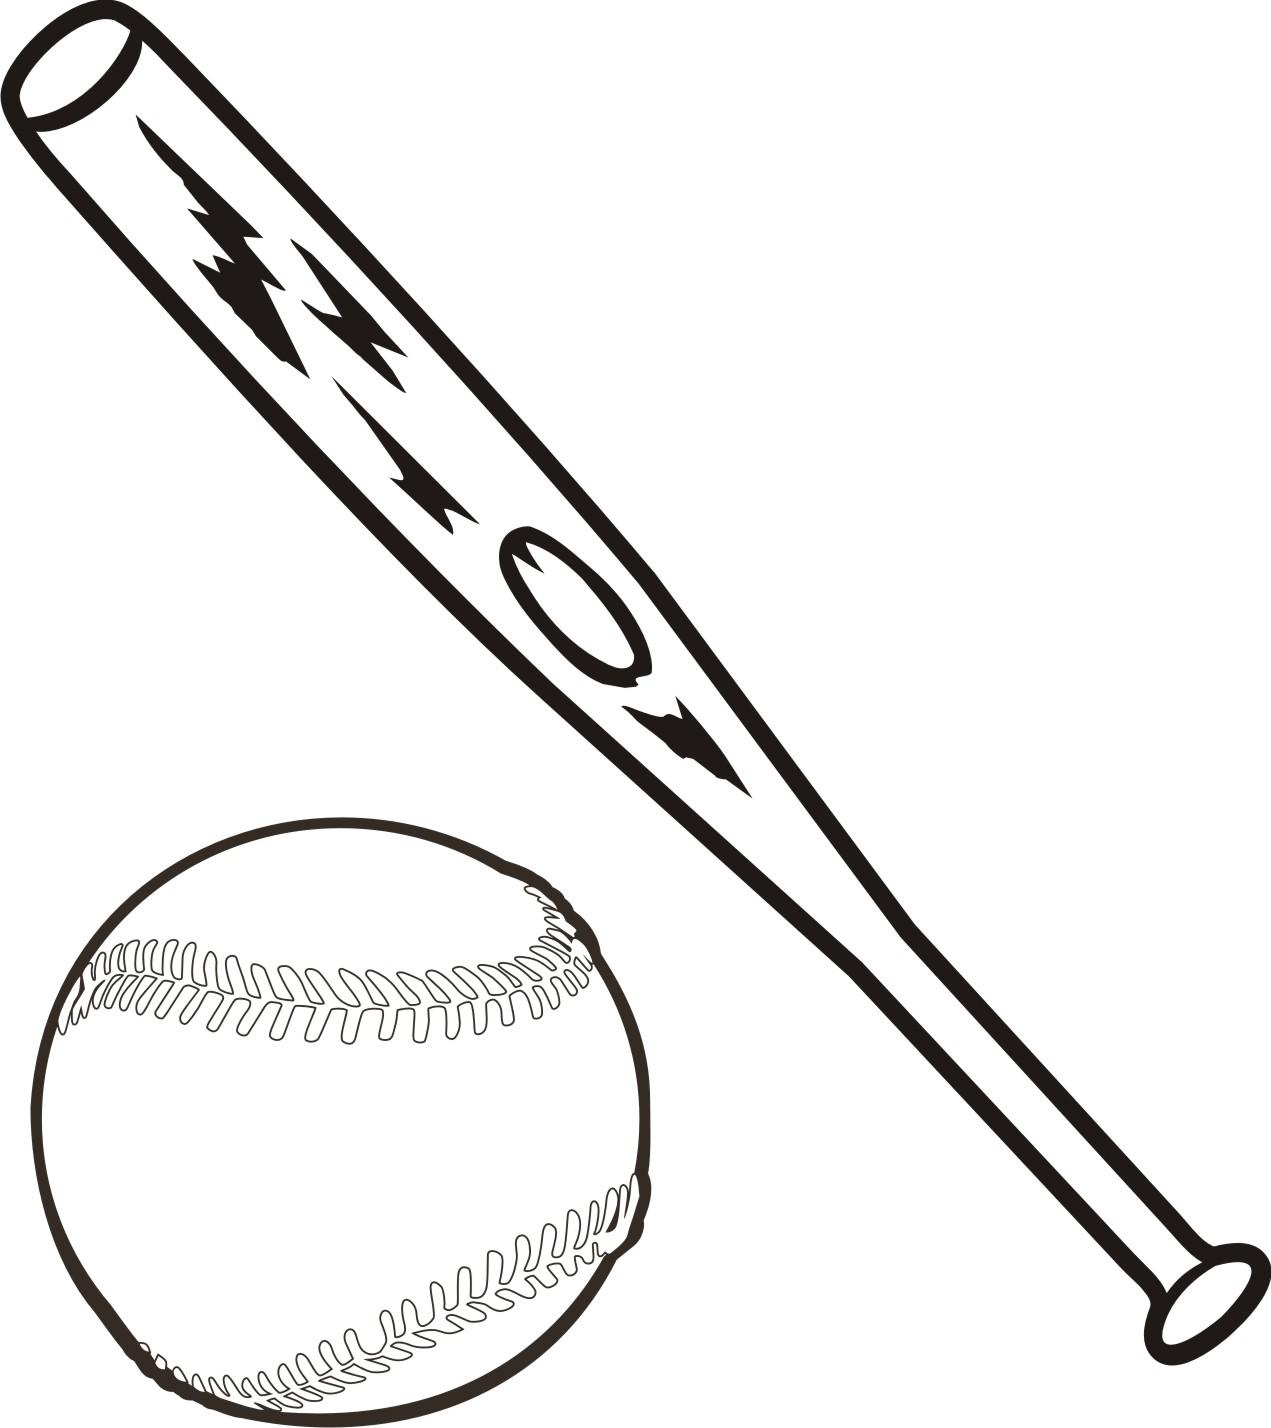 1271x1428 Baseball Bat Softball Bats Crossed Clipart 2